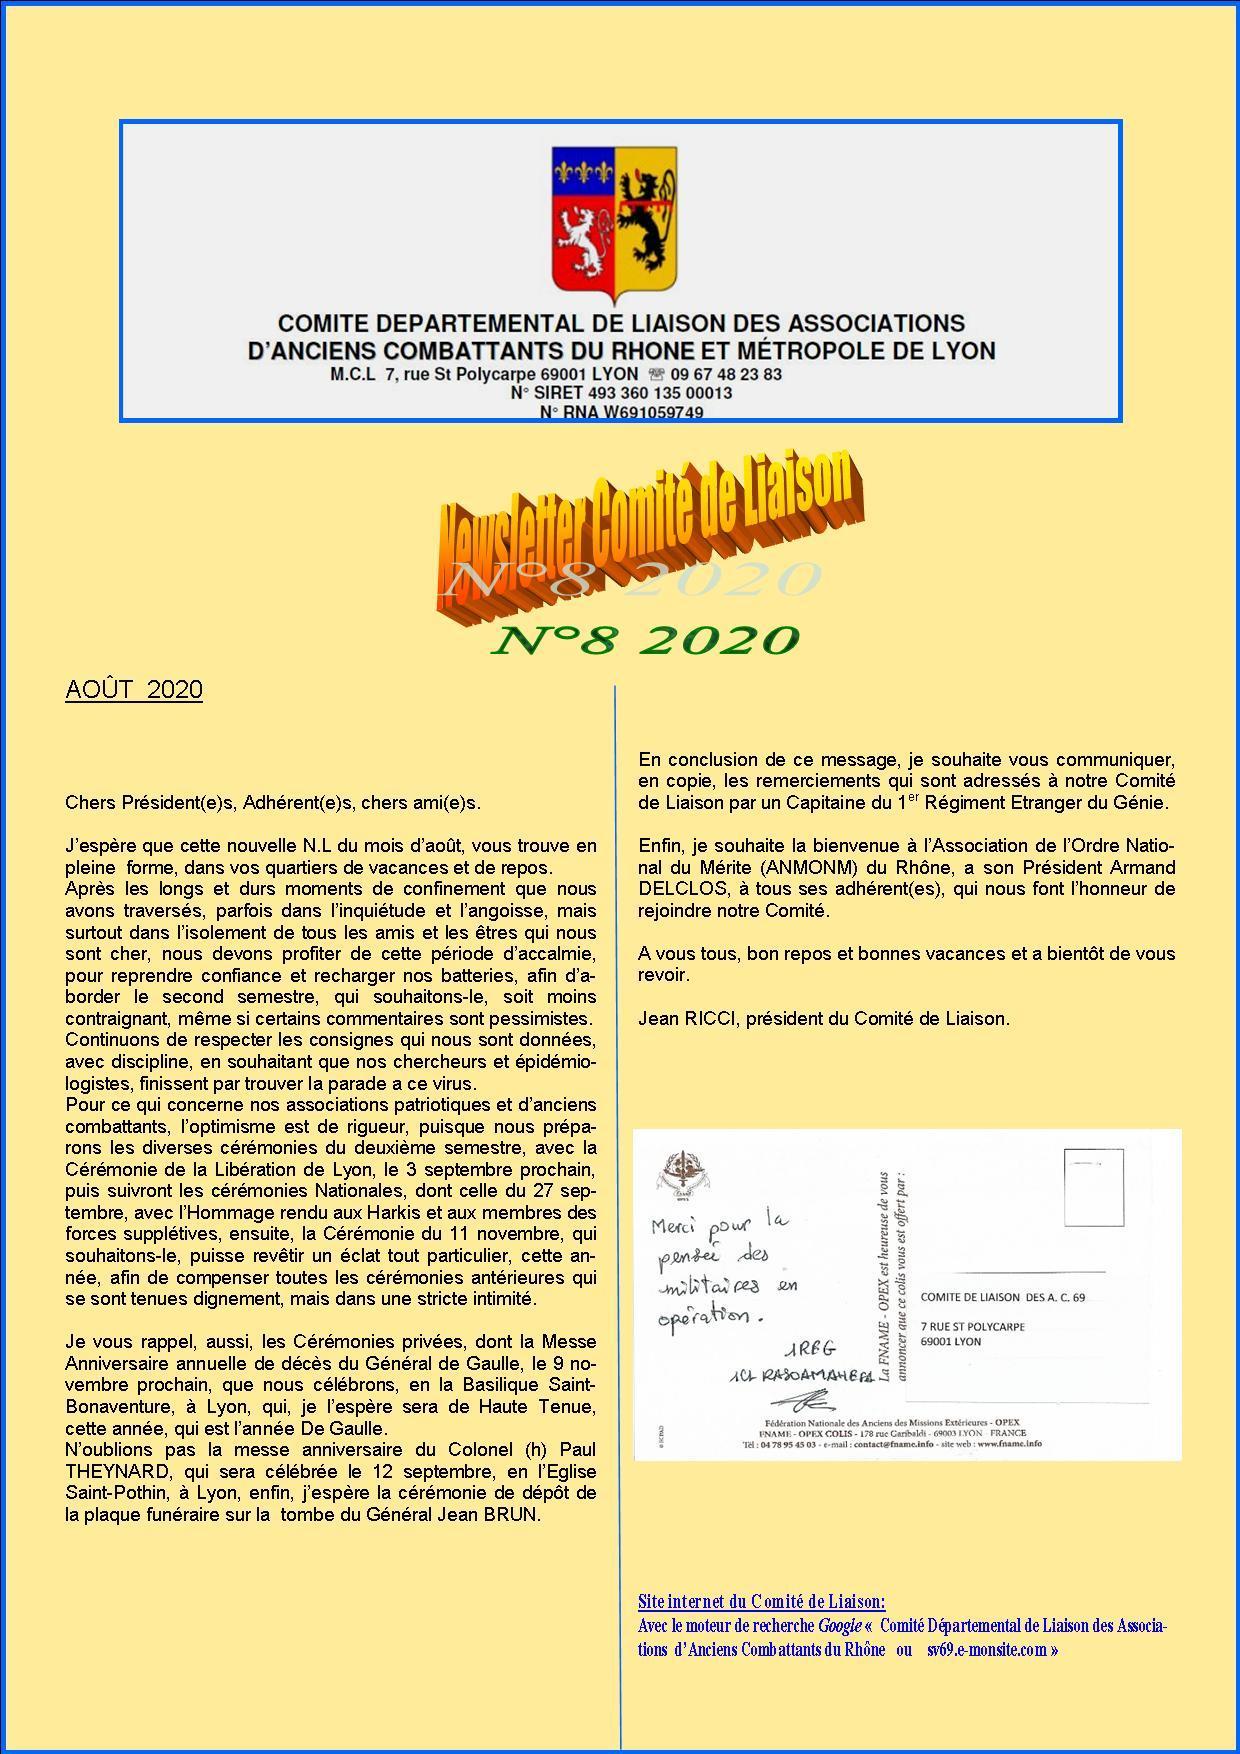 Newsletter comite de liaisonn 8 2020